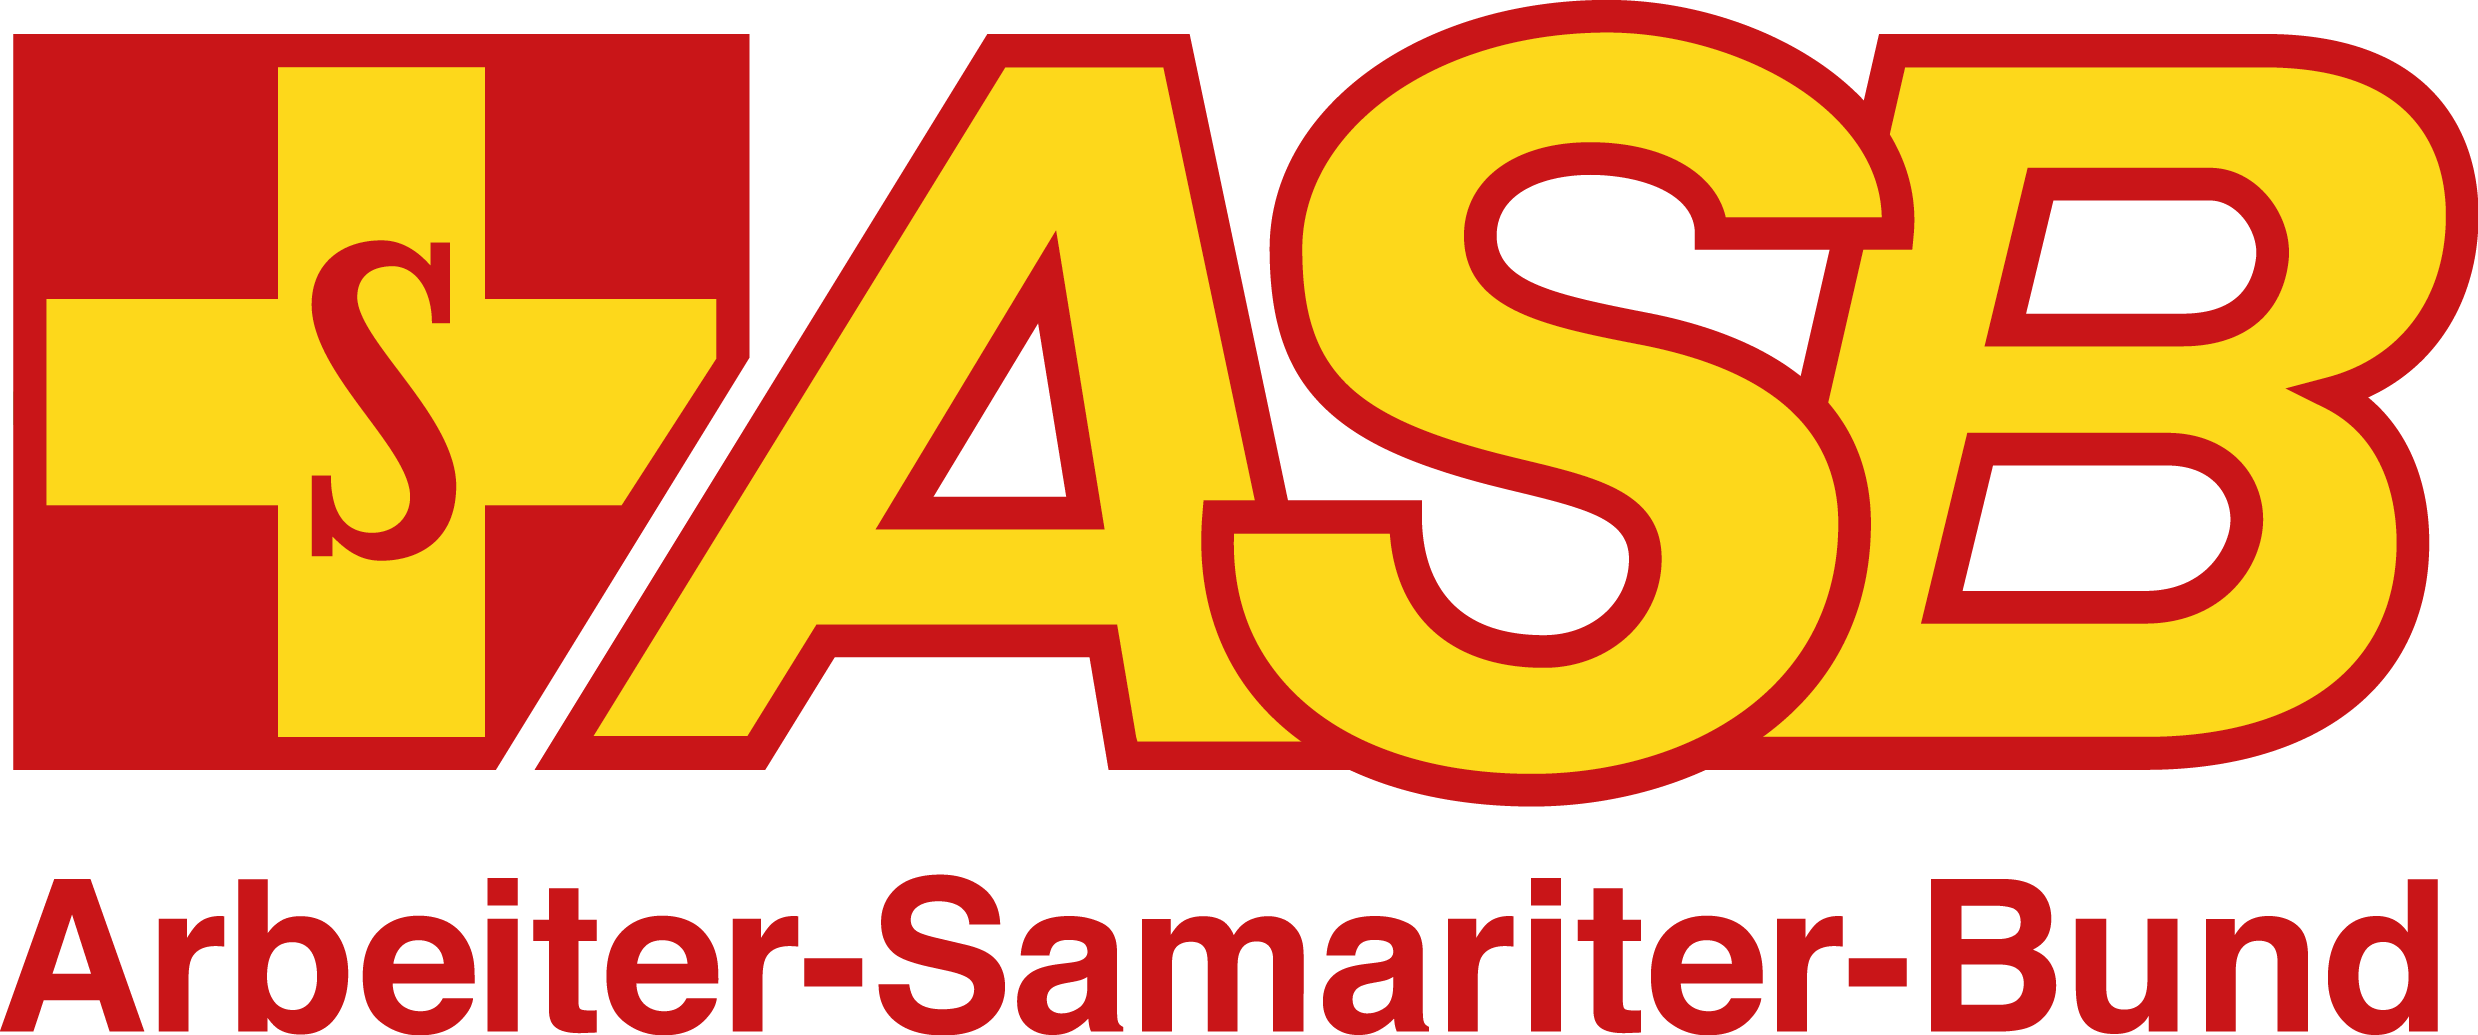 ASB Bremen |Arbeiter-Samariter-Bund Landesverband Bremen e.V.